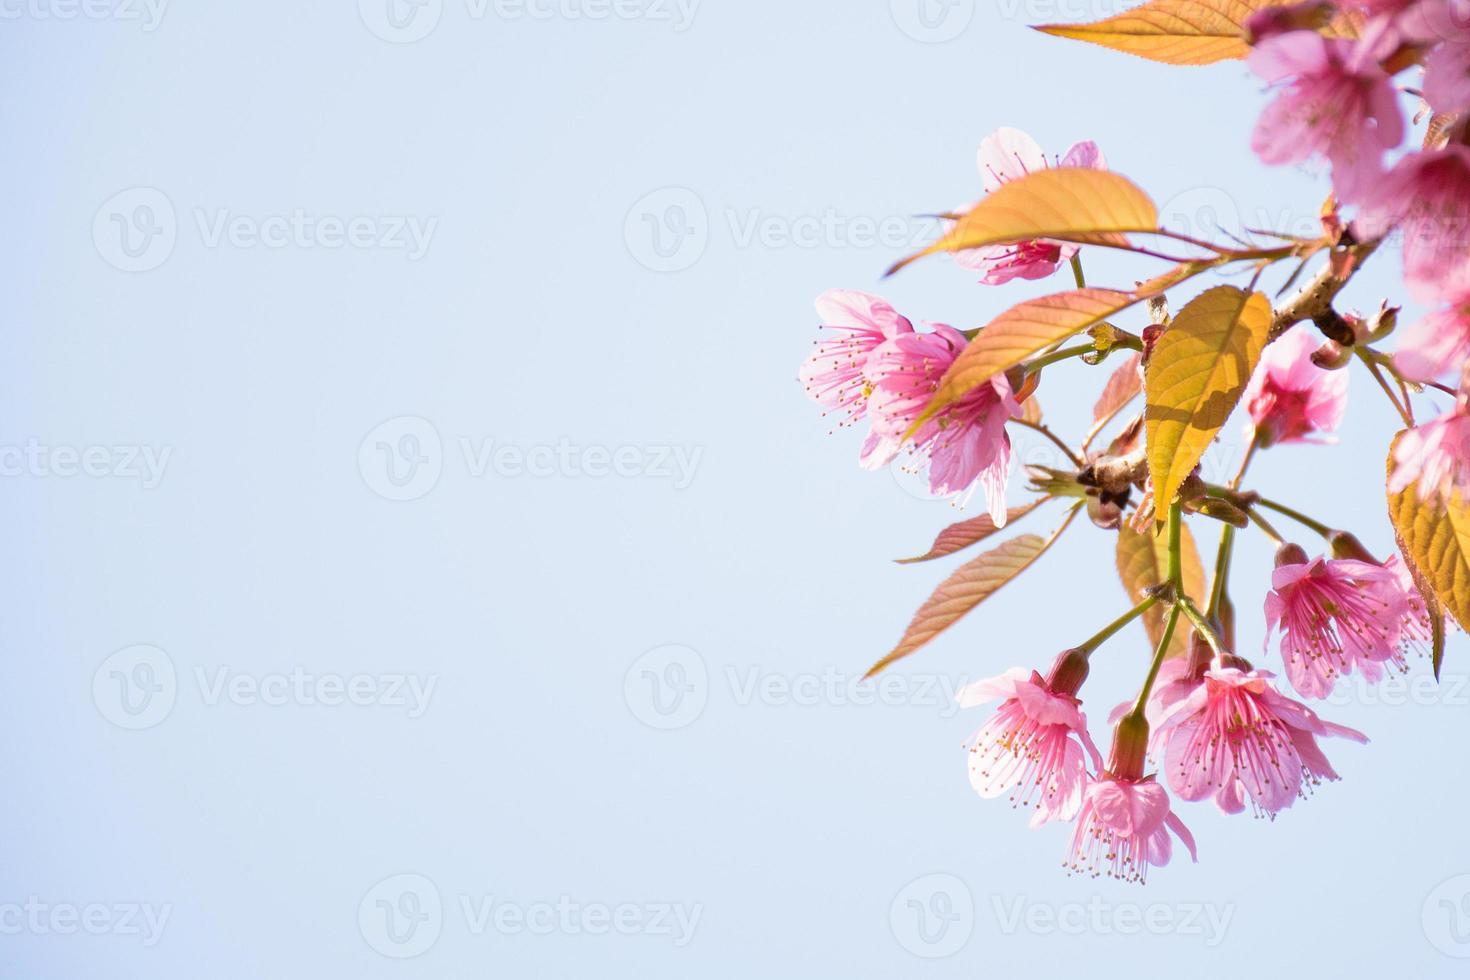 wilde Himalaya-Kirschblüten isolierten hellblauen Himmel foto